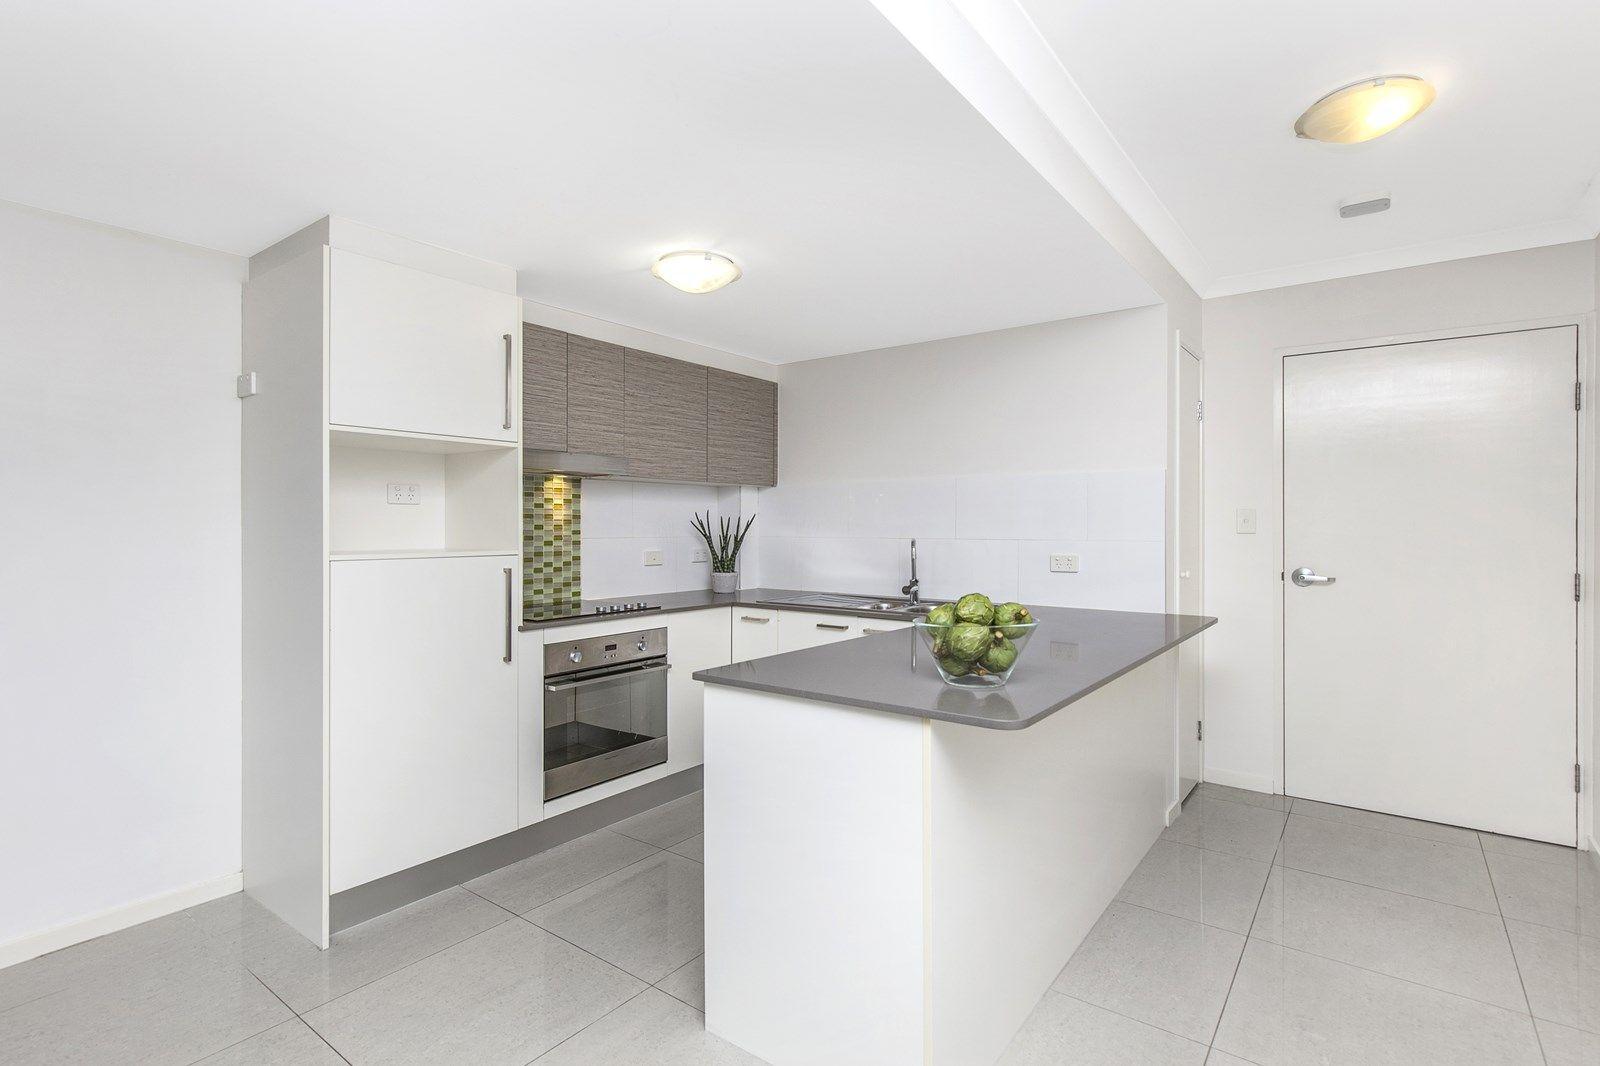 14/28 Carl Street, Woolloongabba QLD 4102, Image 2